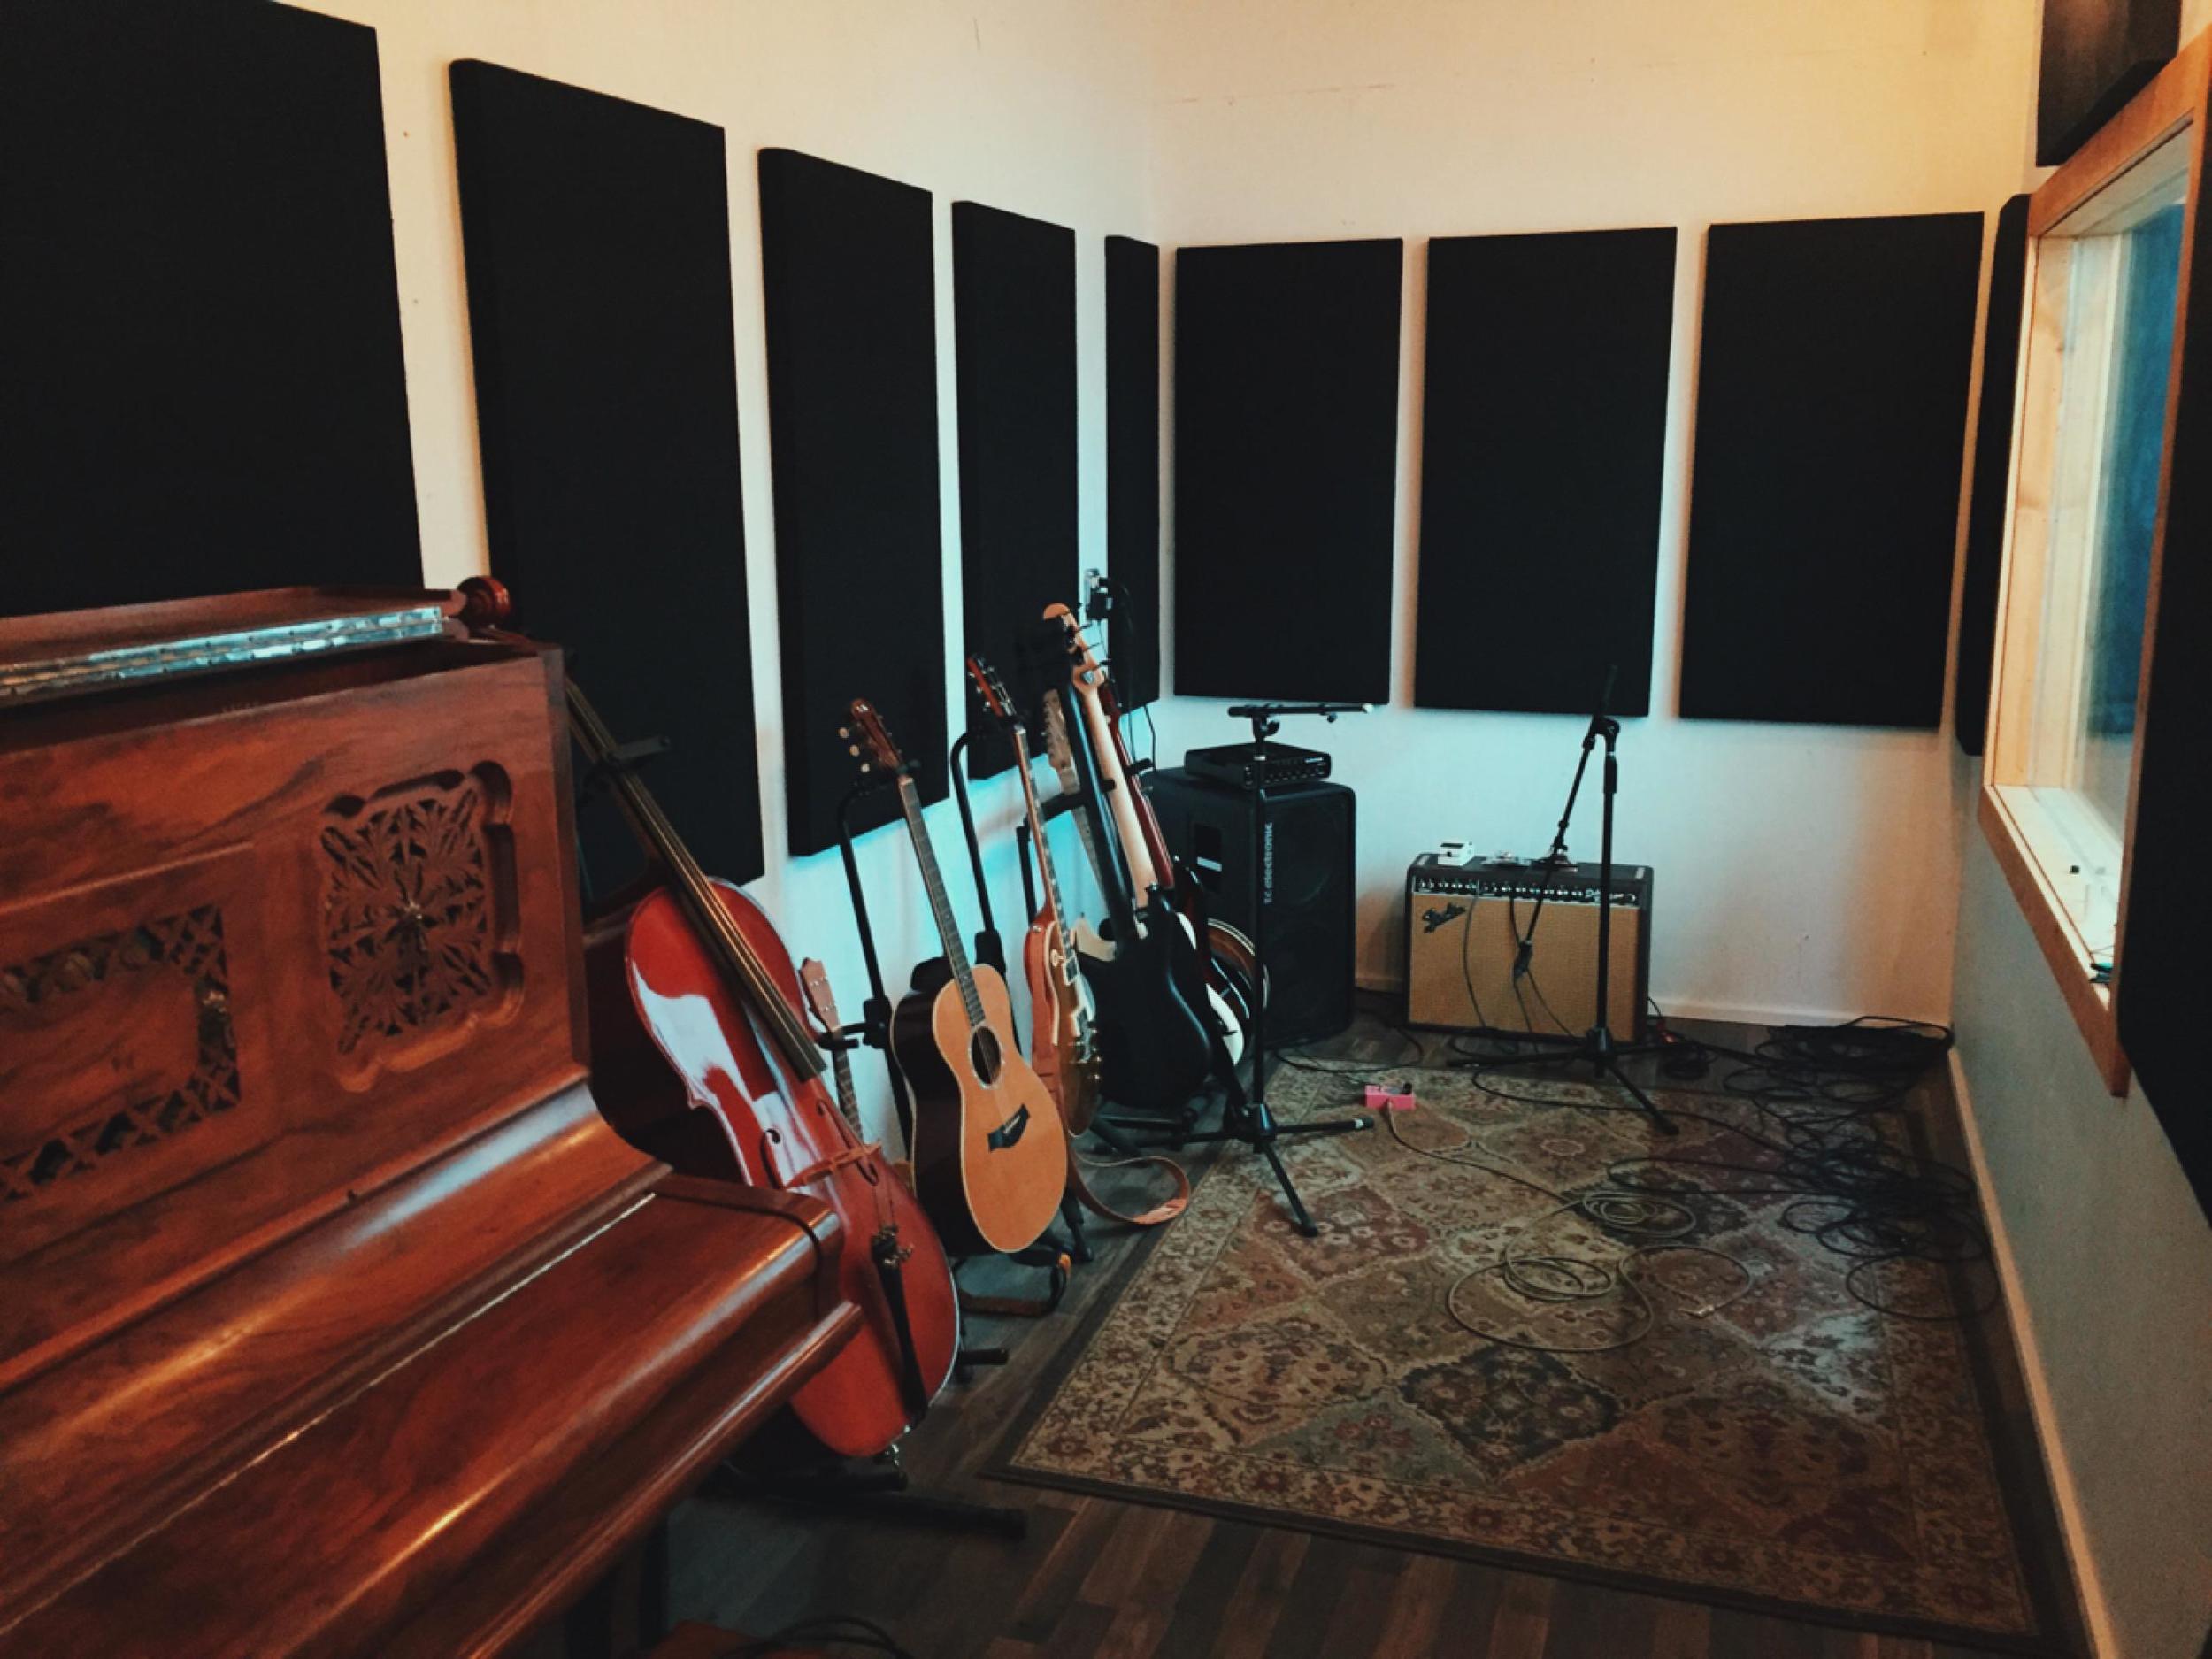 The Humble Beast Studio